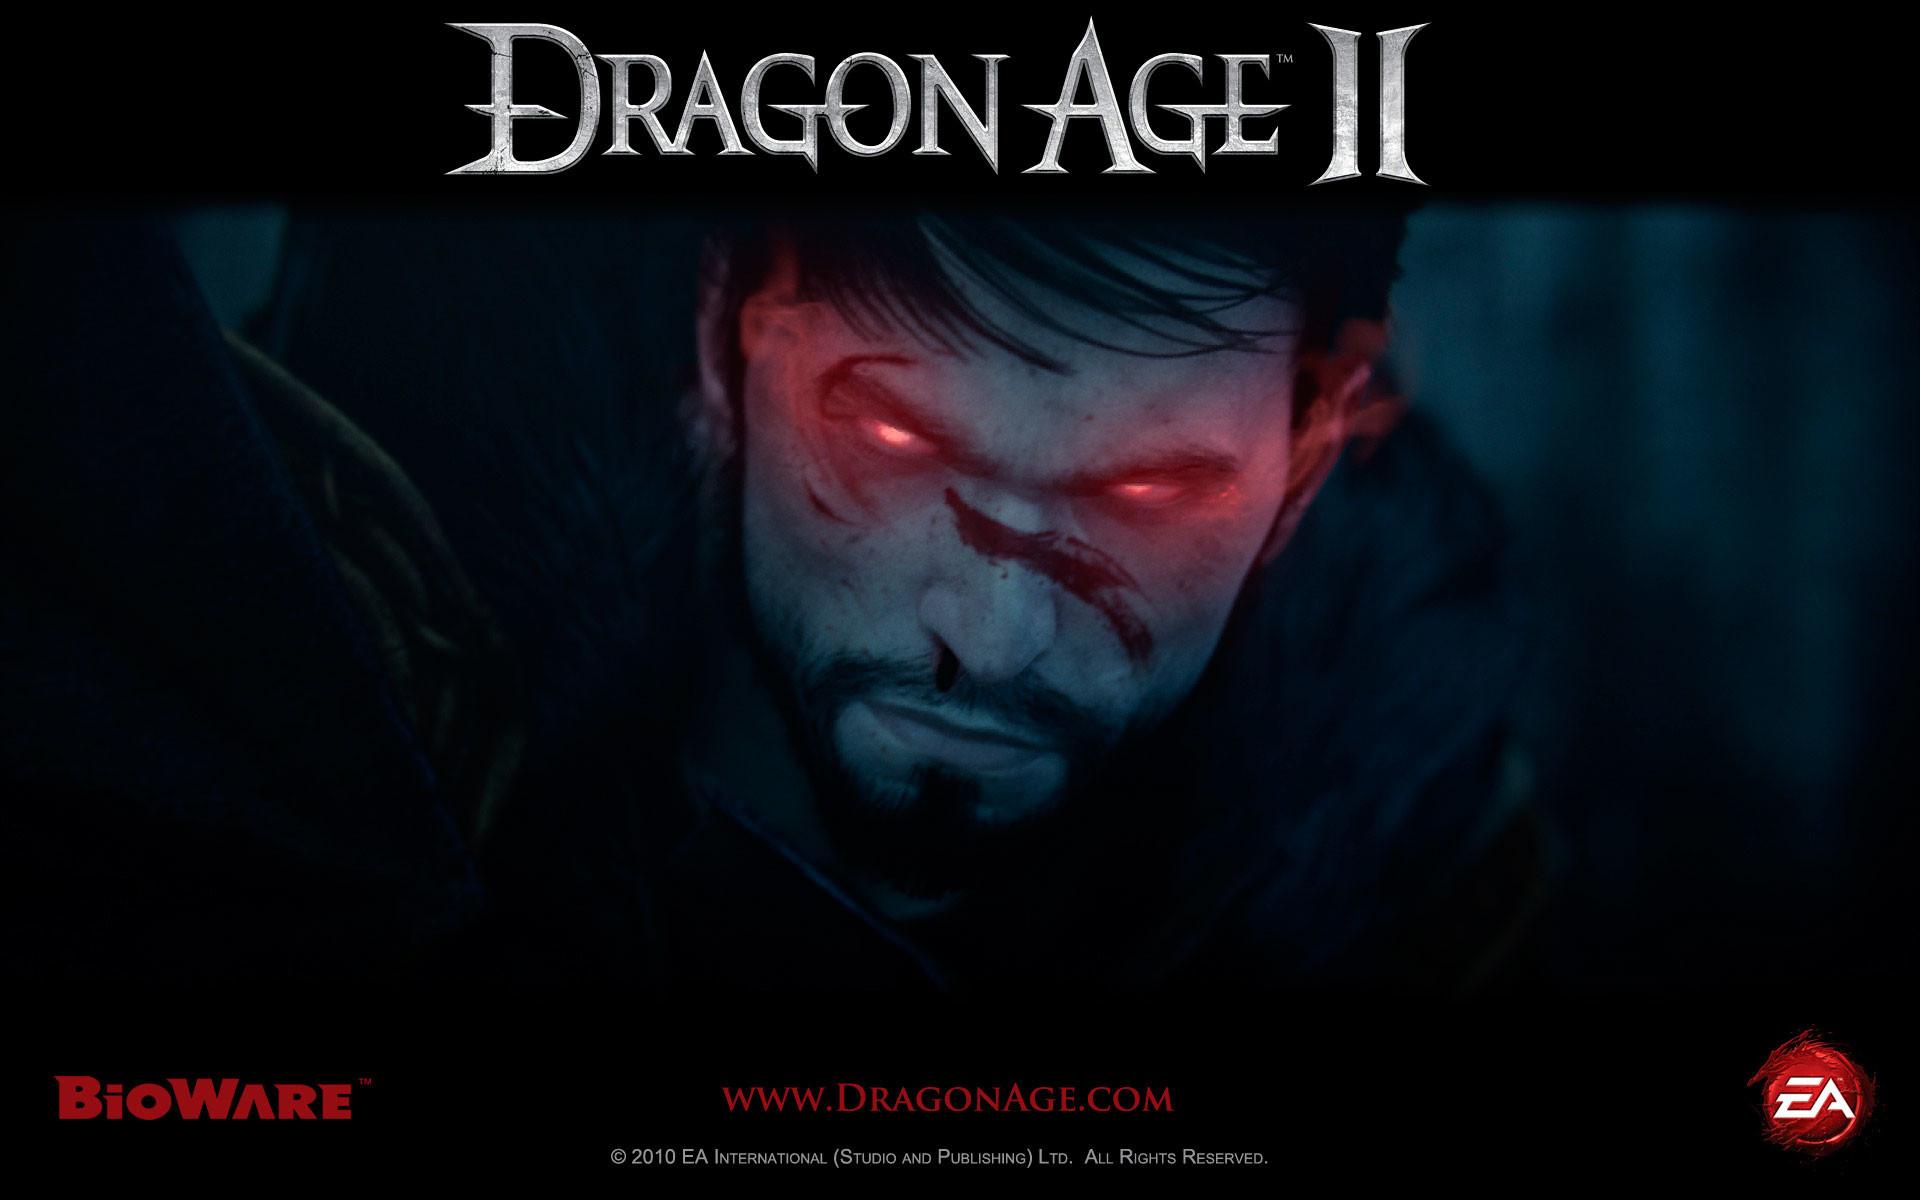 … Dragon Age II HD wallpapers: Tags:desktop …